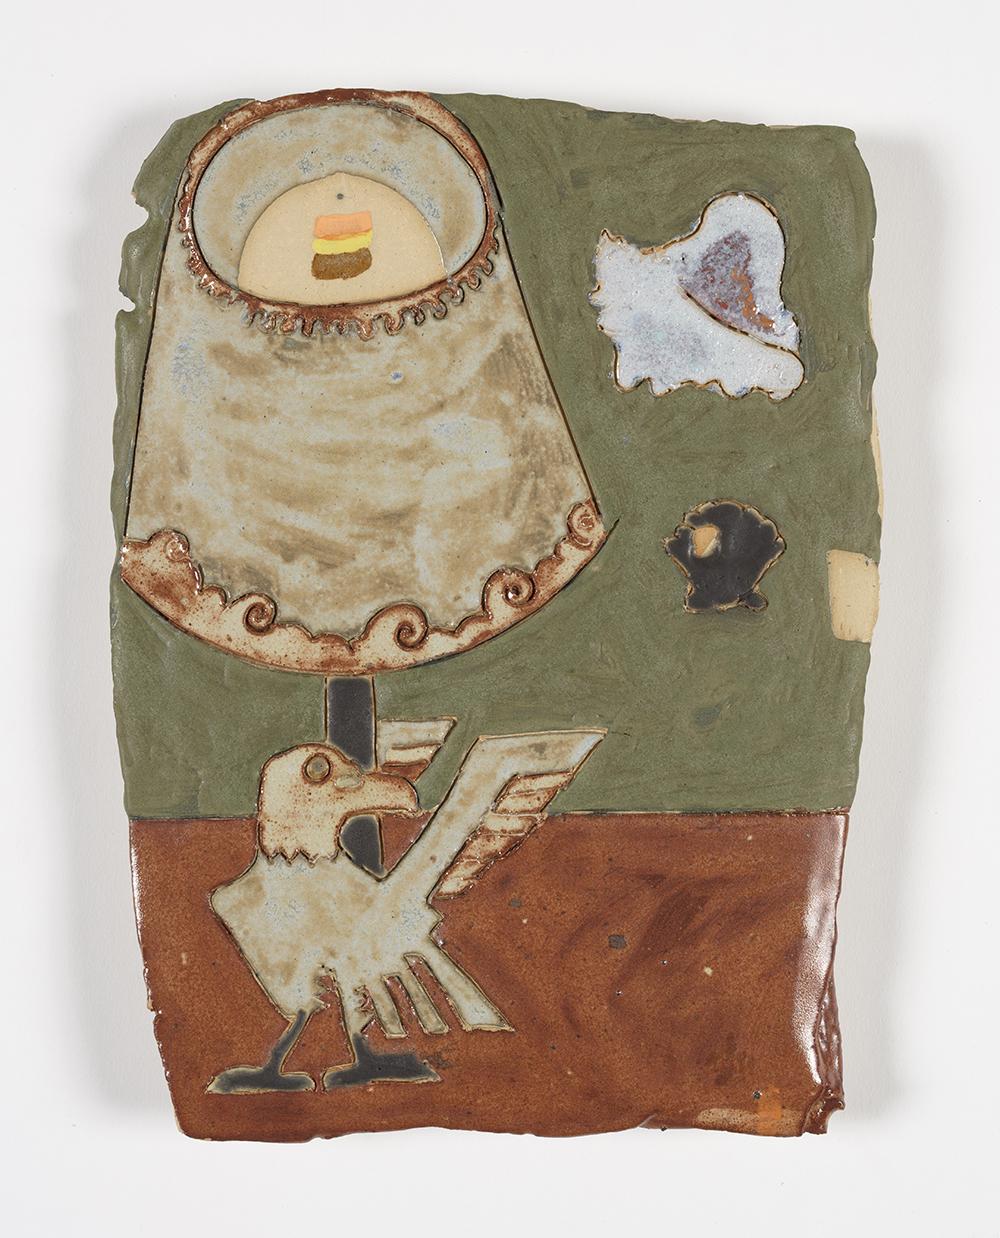 Kevin McNamee-Tweed.<em> Shore House</em>, 2019. Glazed ceramic, 11 x 8 inches (27.9 x 20.3 cm)